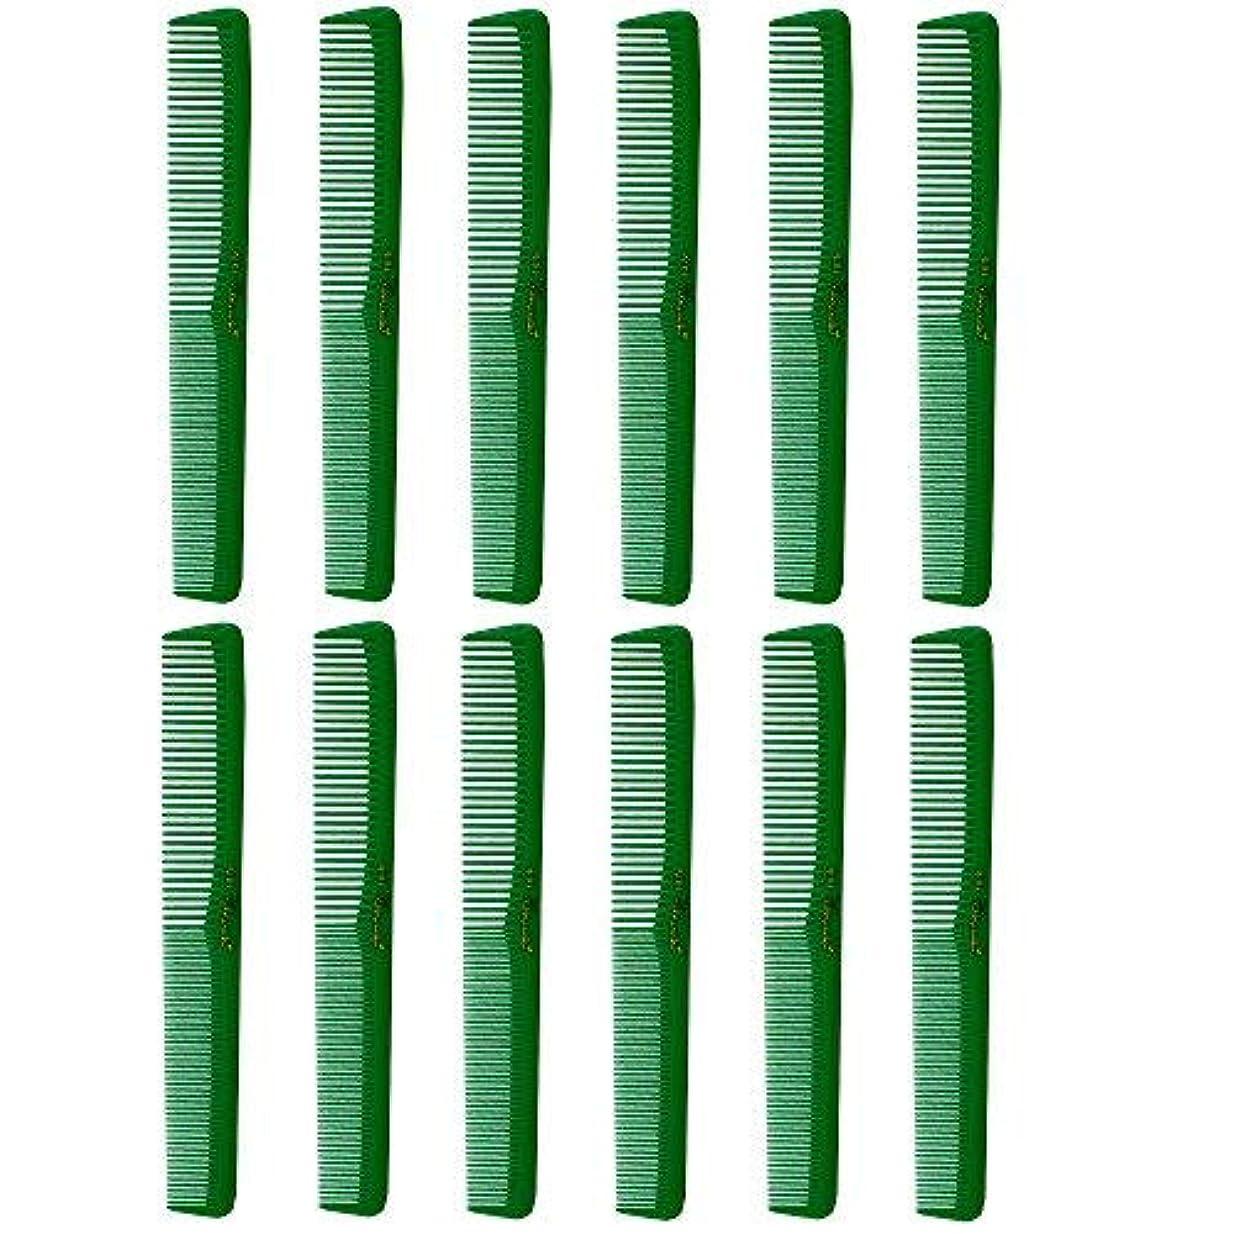 Barber Beauty Hair Cleopatra 400 All Purpose Combs (12 Pack) 12 x SB-C400-GREEN [並行輸入品]